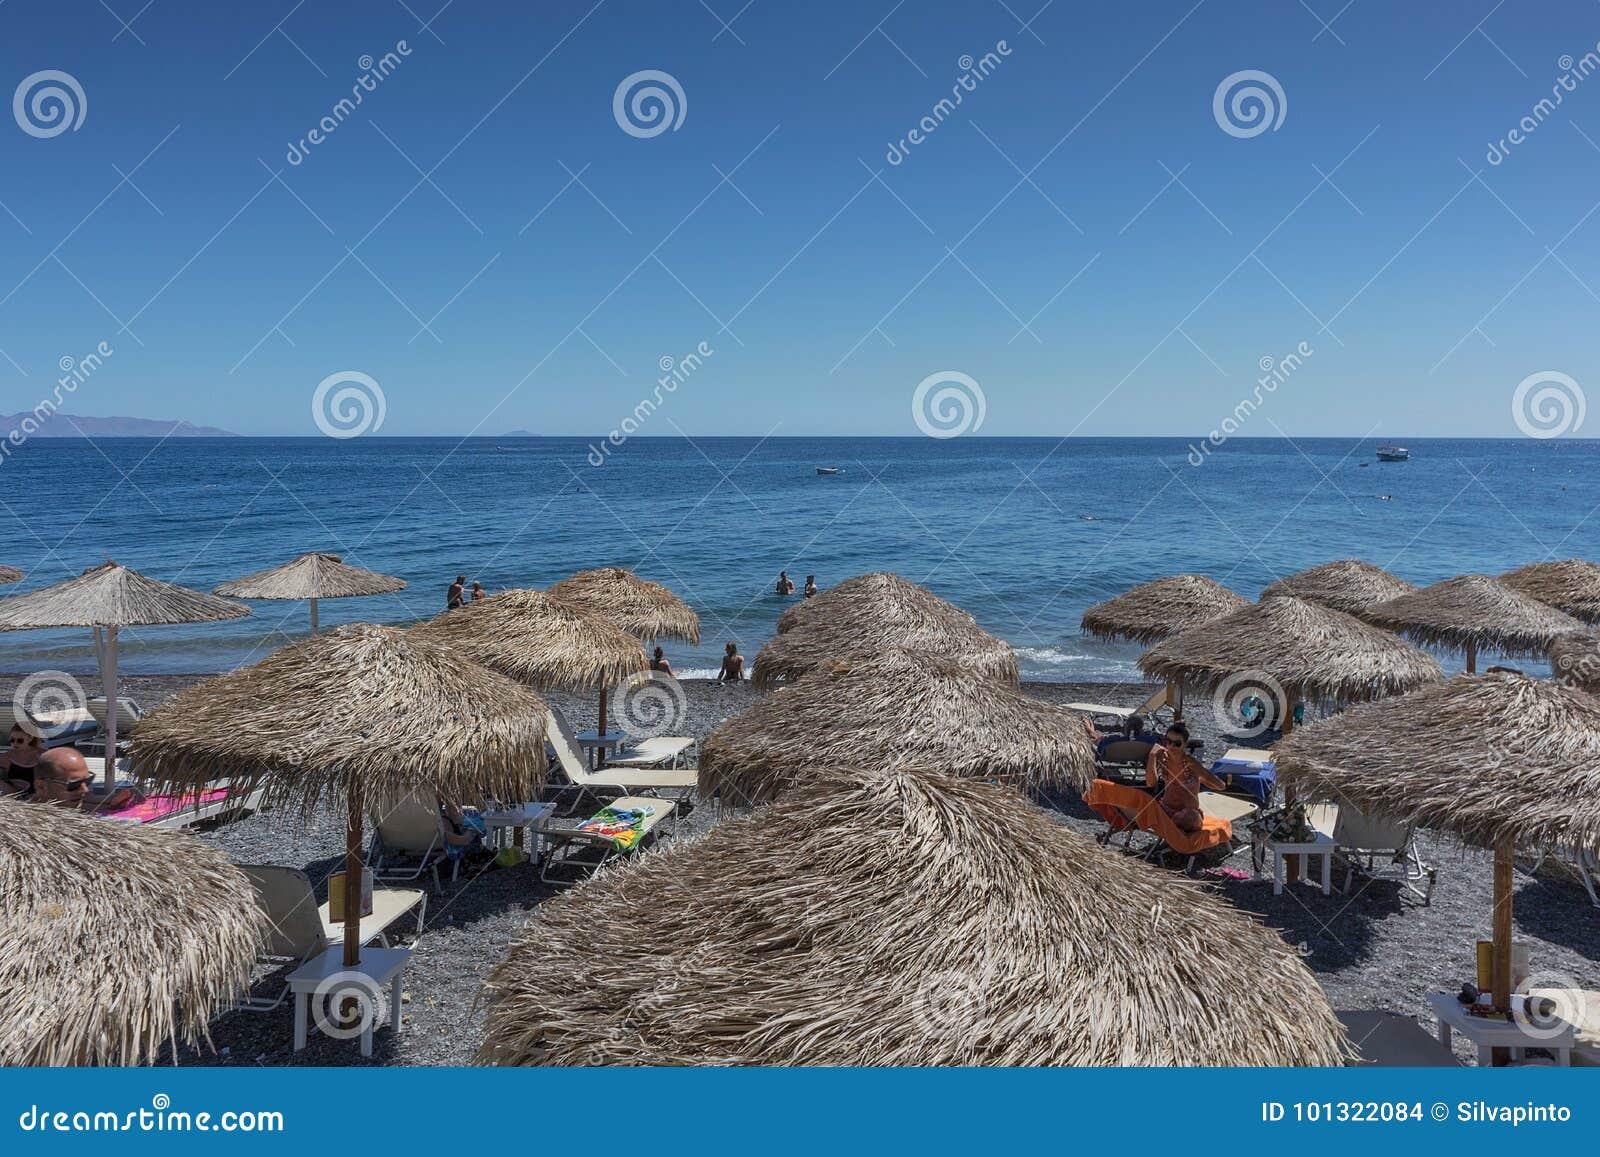 Strand SANTORINI/GREECE am 5. September - Kamari in Santorini, Griechenland sant